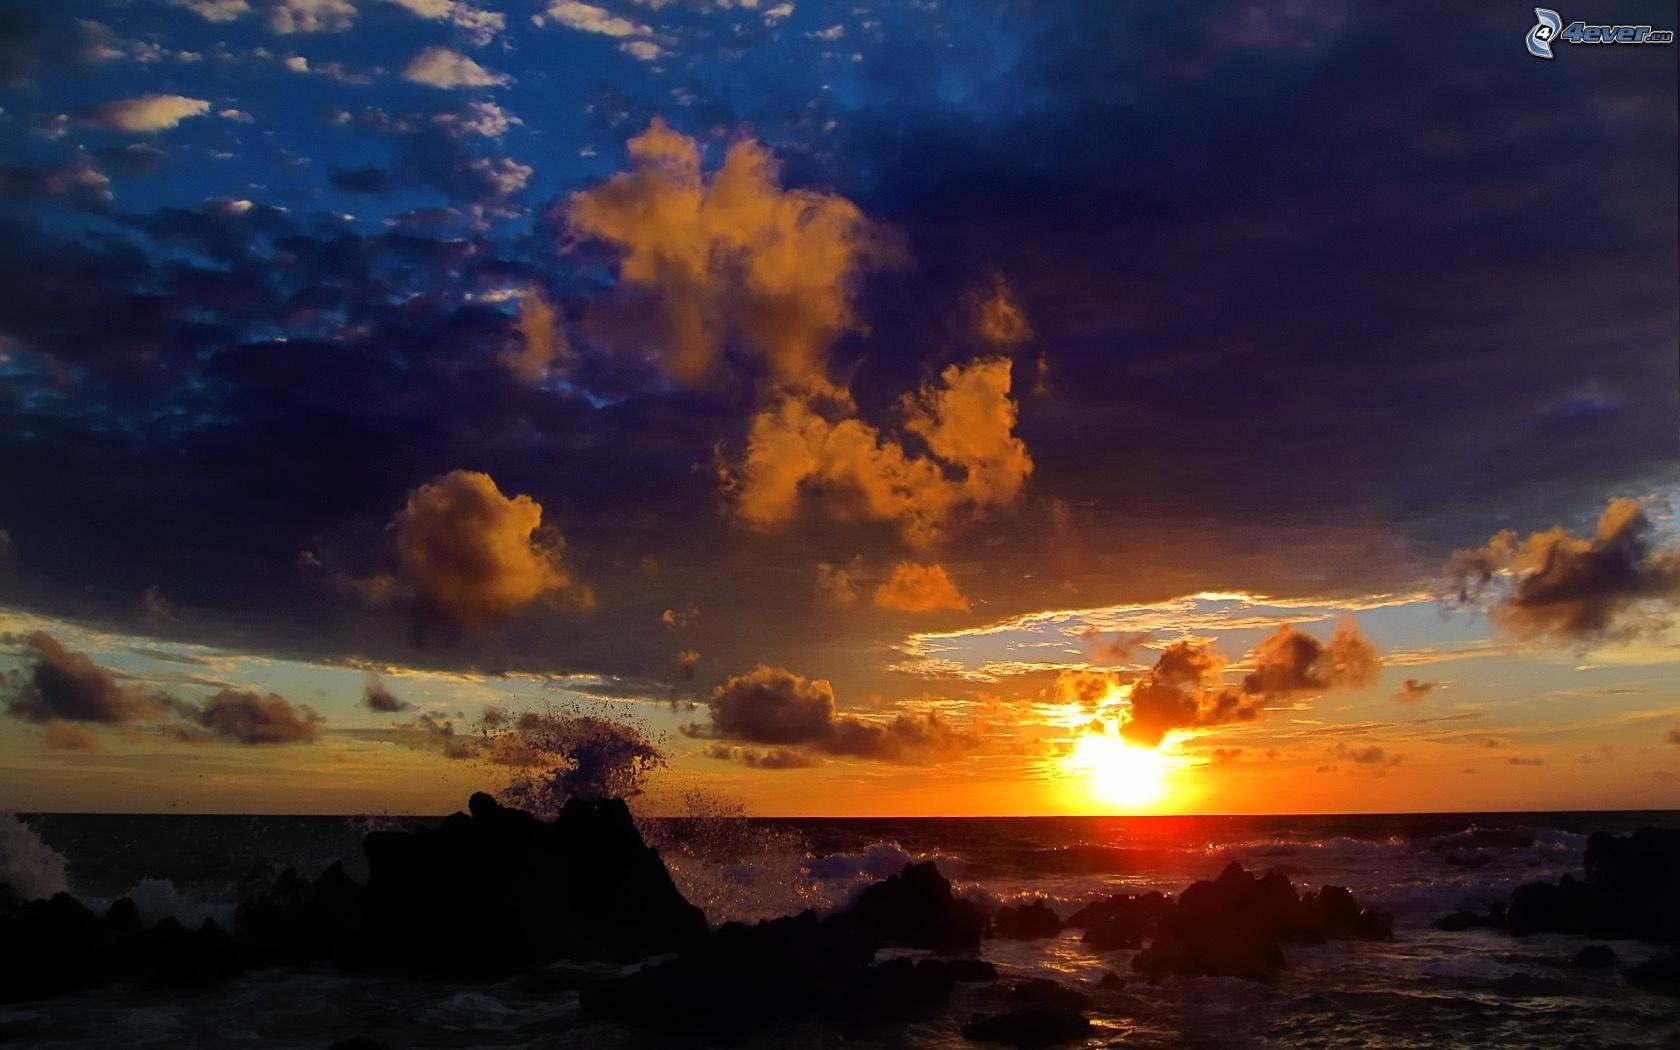 Zalazak sunca  - Page 4 Zapad-slnka-za-morom,-skalnata-plaz-153773